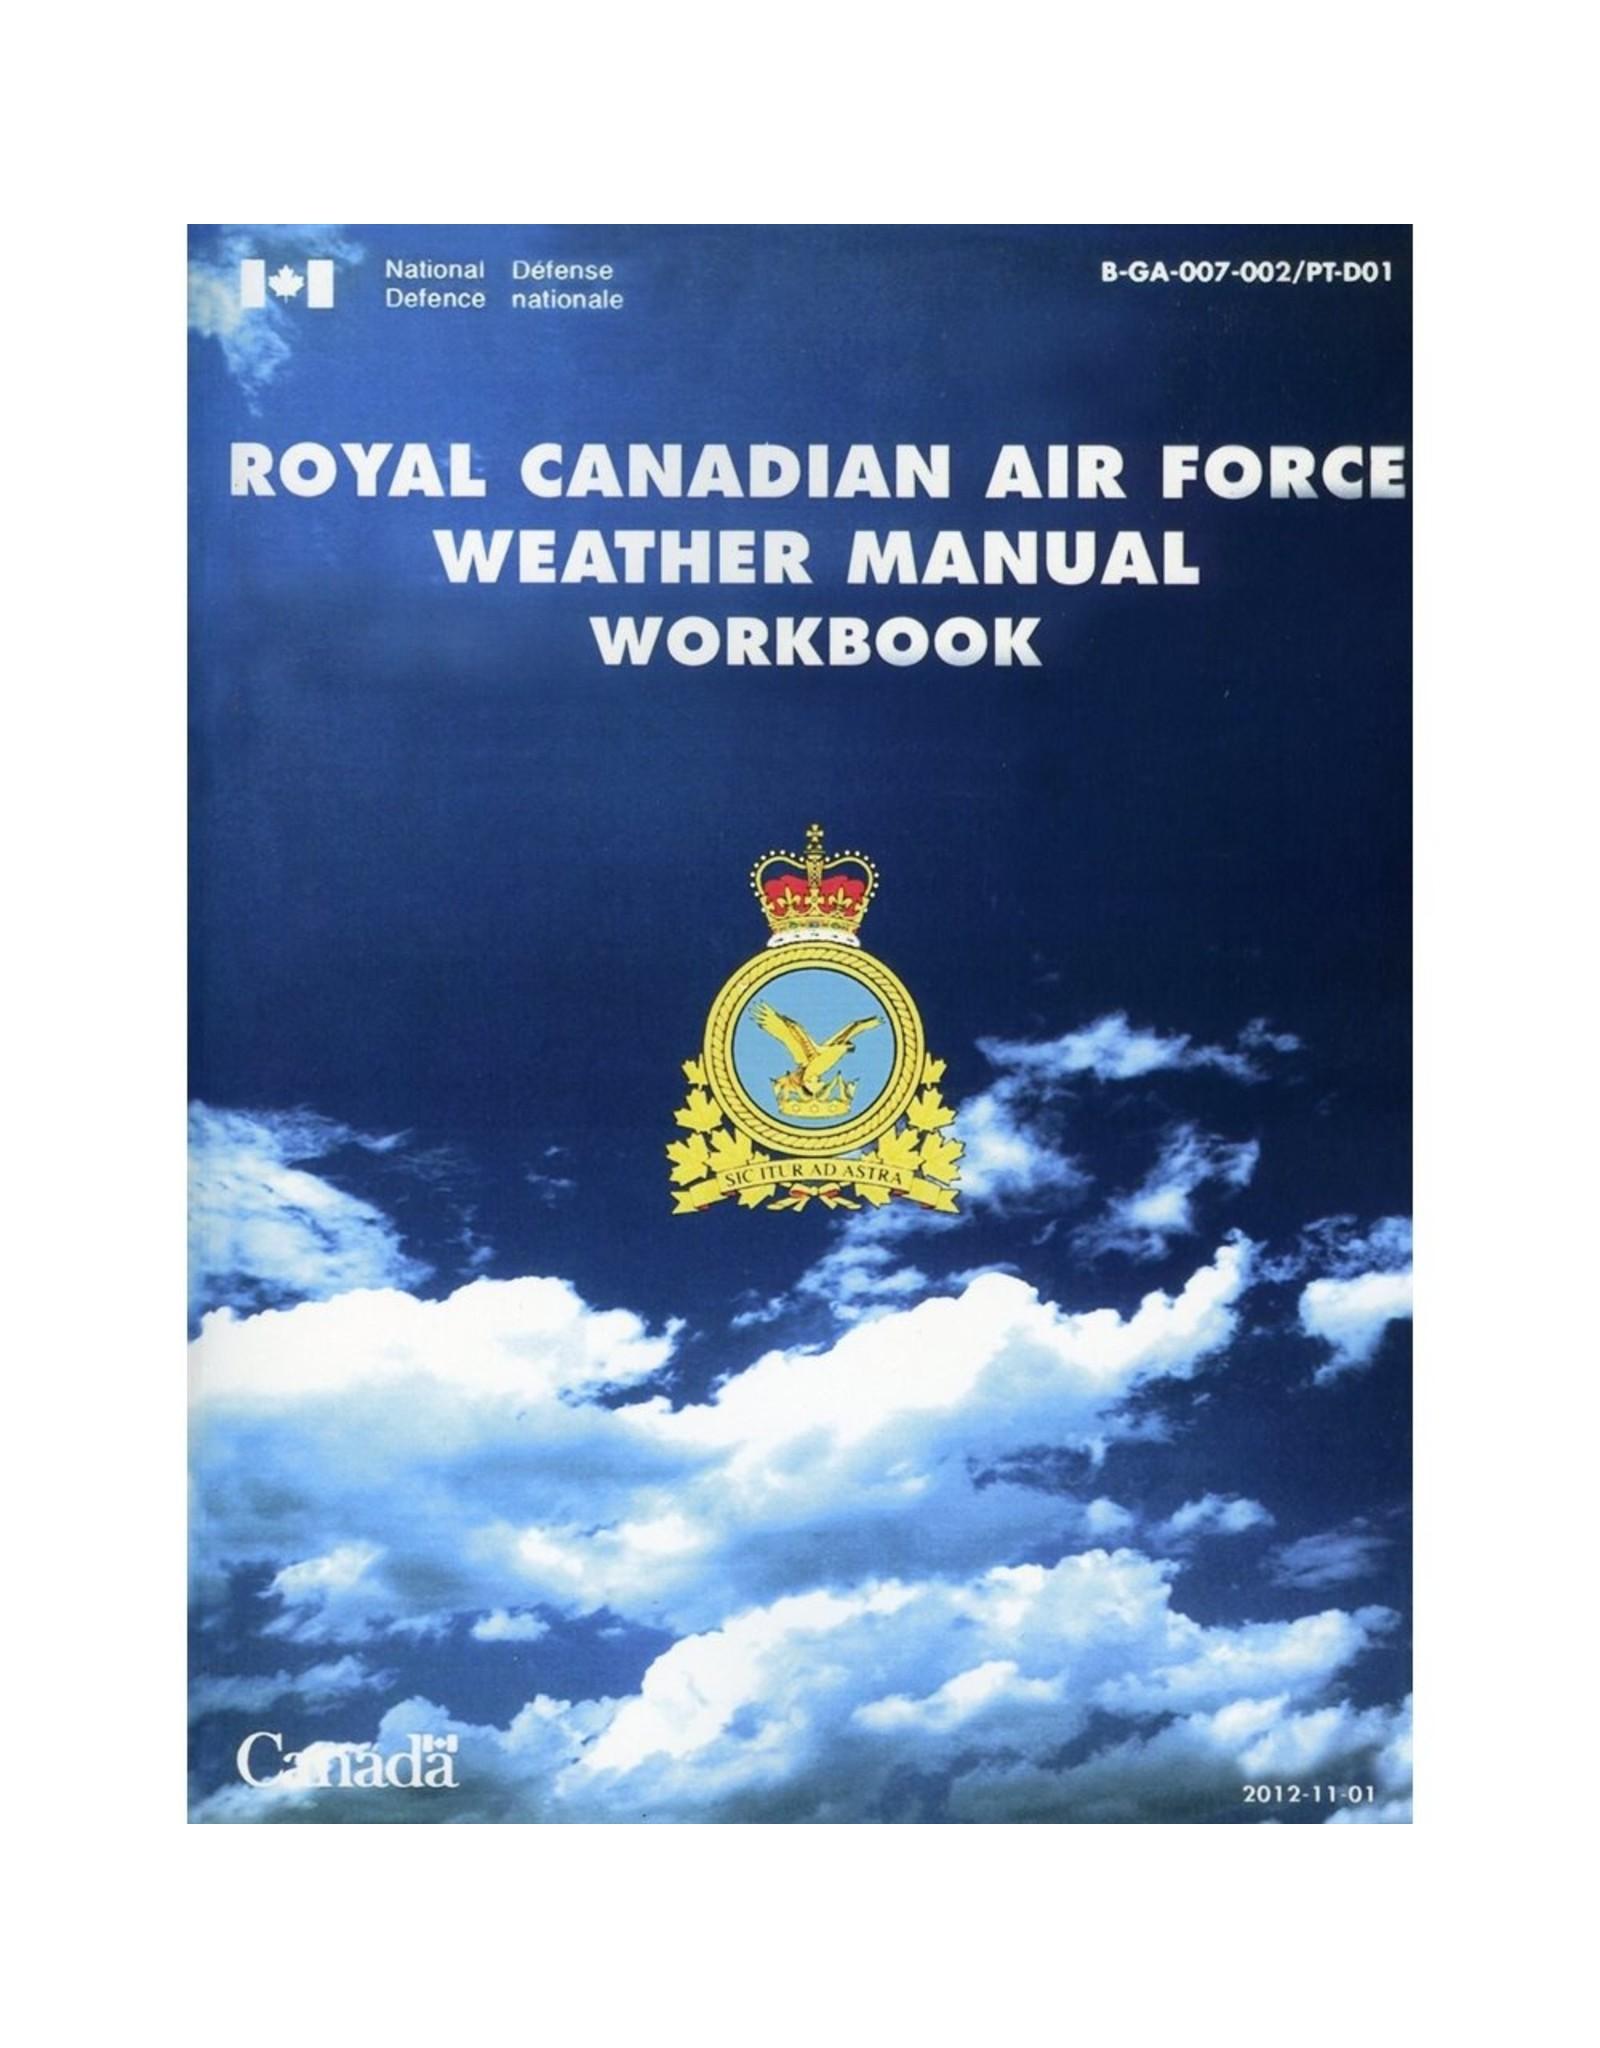 RCAF Weather Manual Workbook